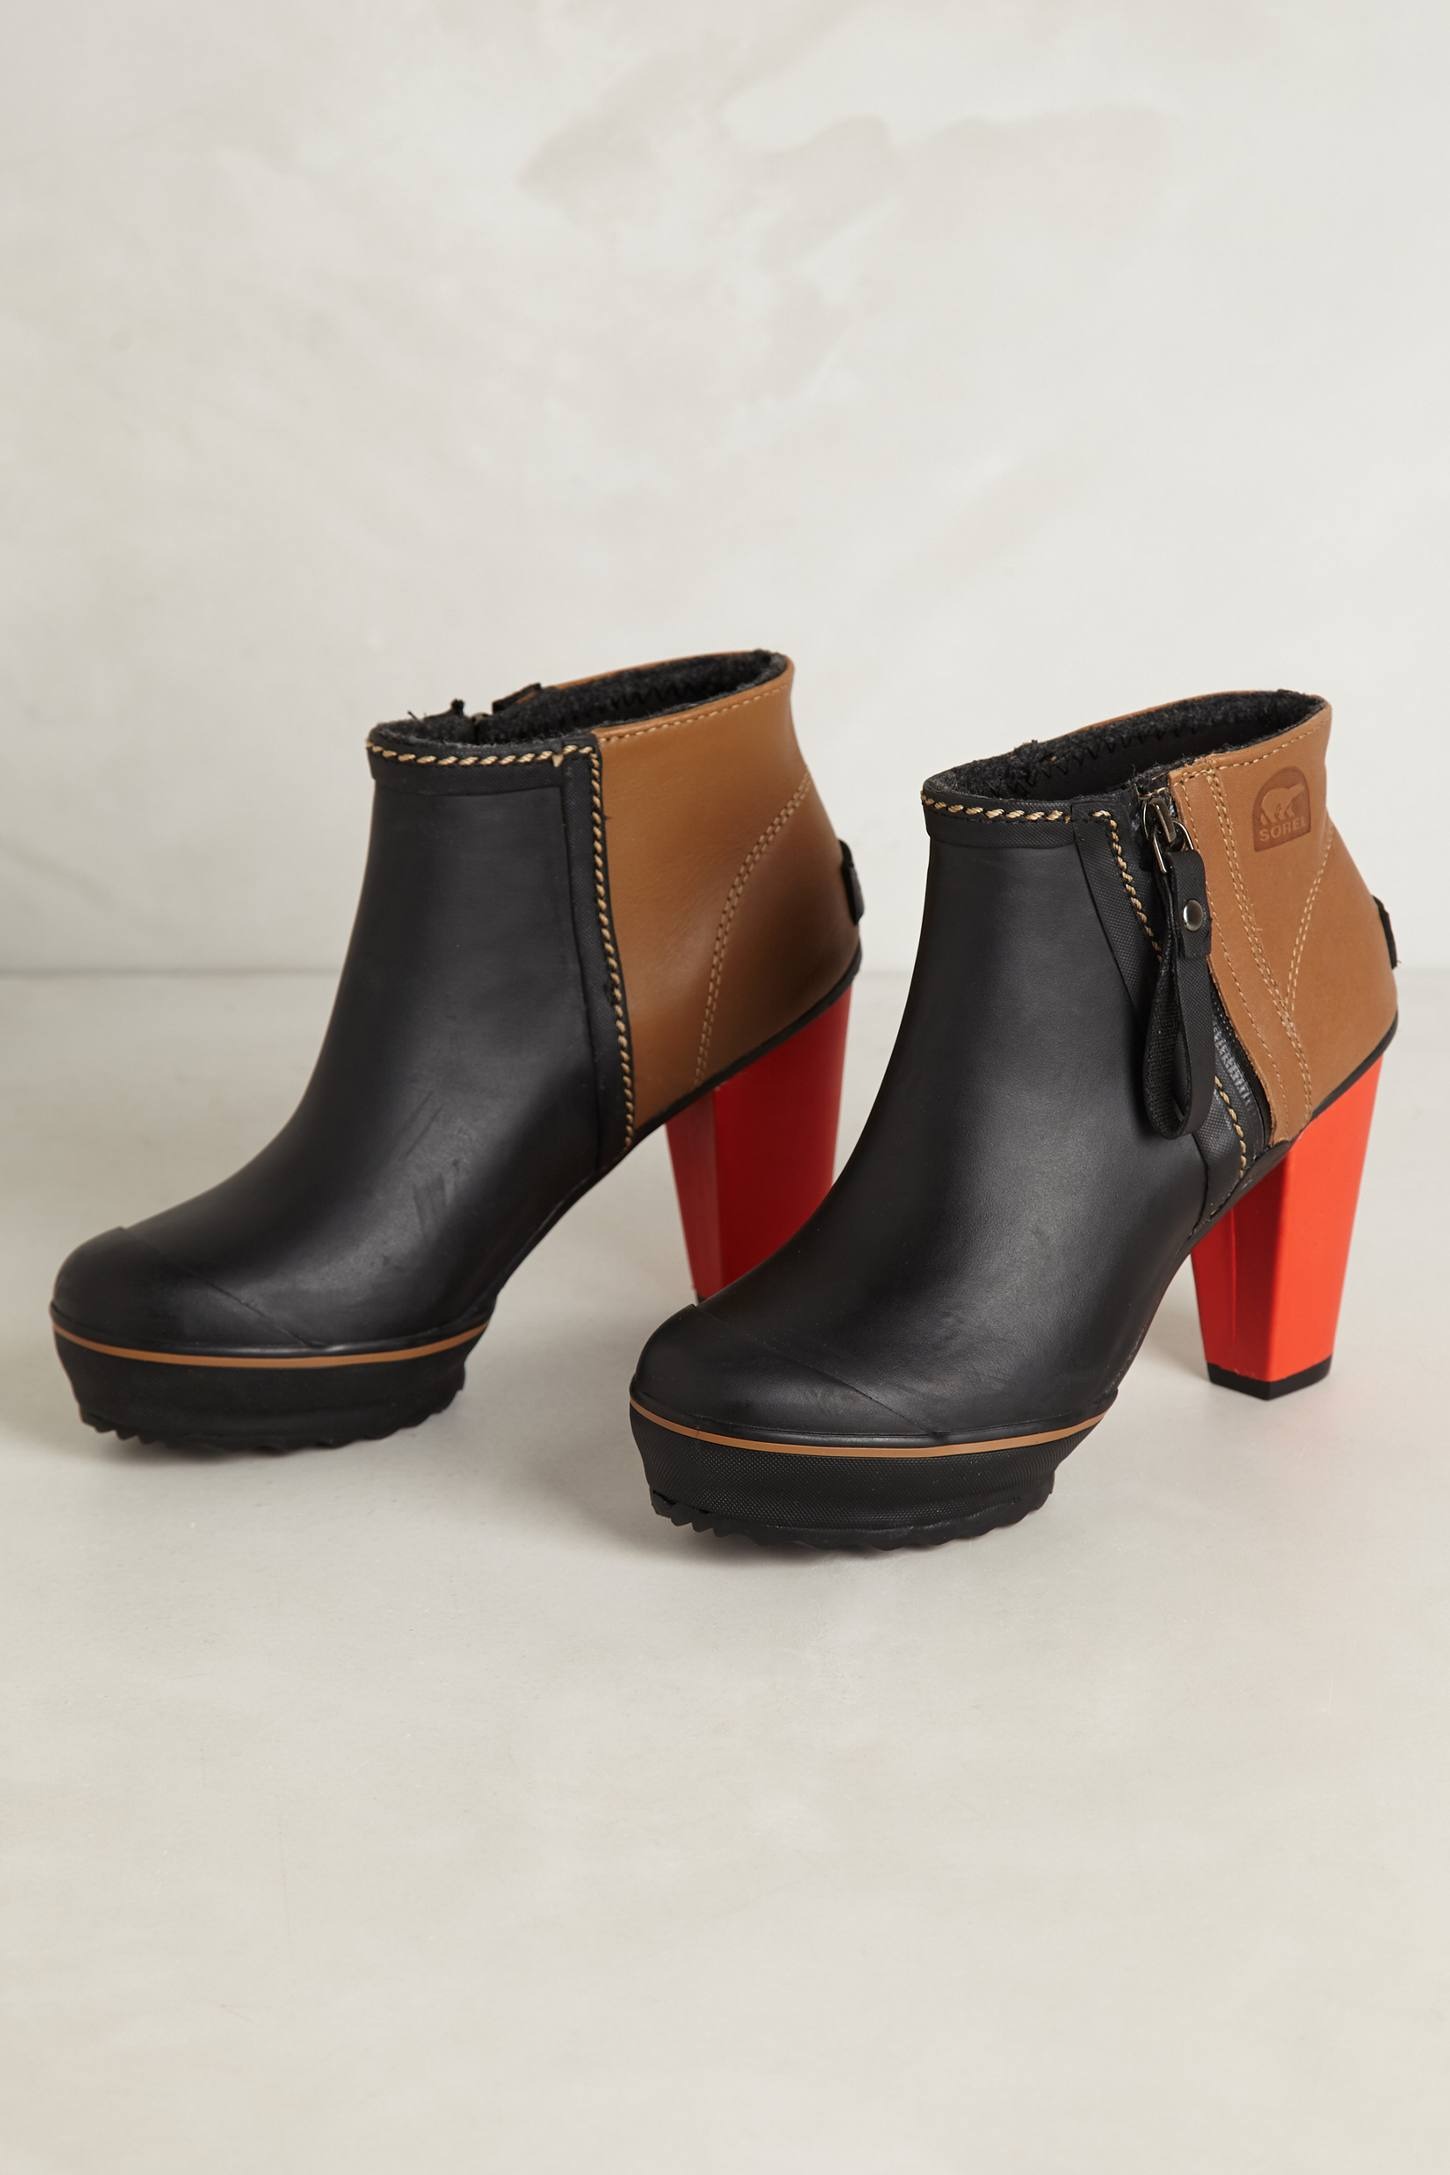 Gallery. Women's Rain Boots